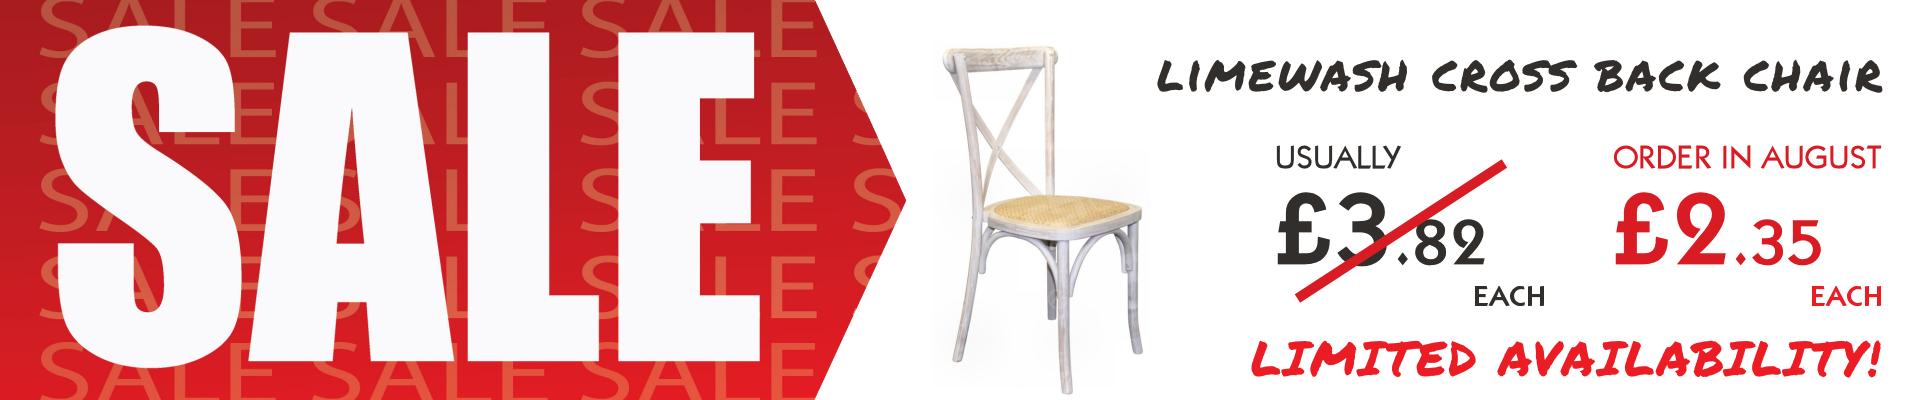 Limewash Cross Back Chair Sale